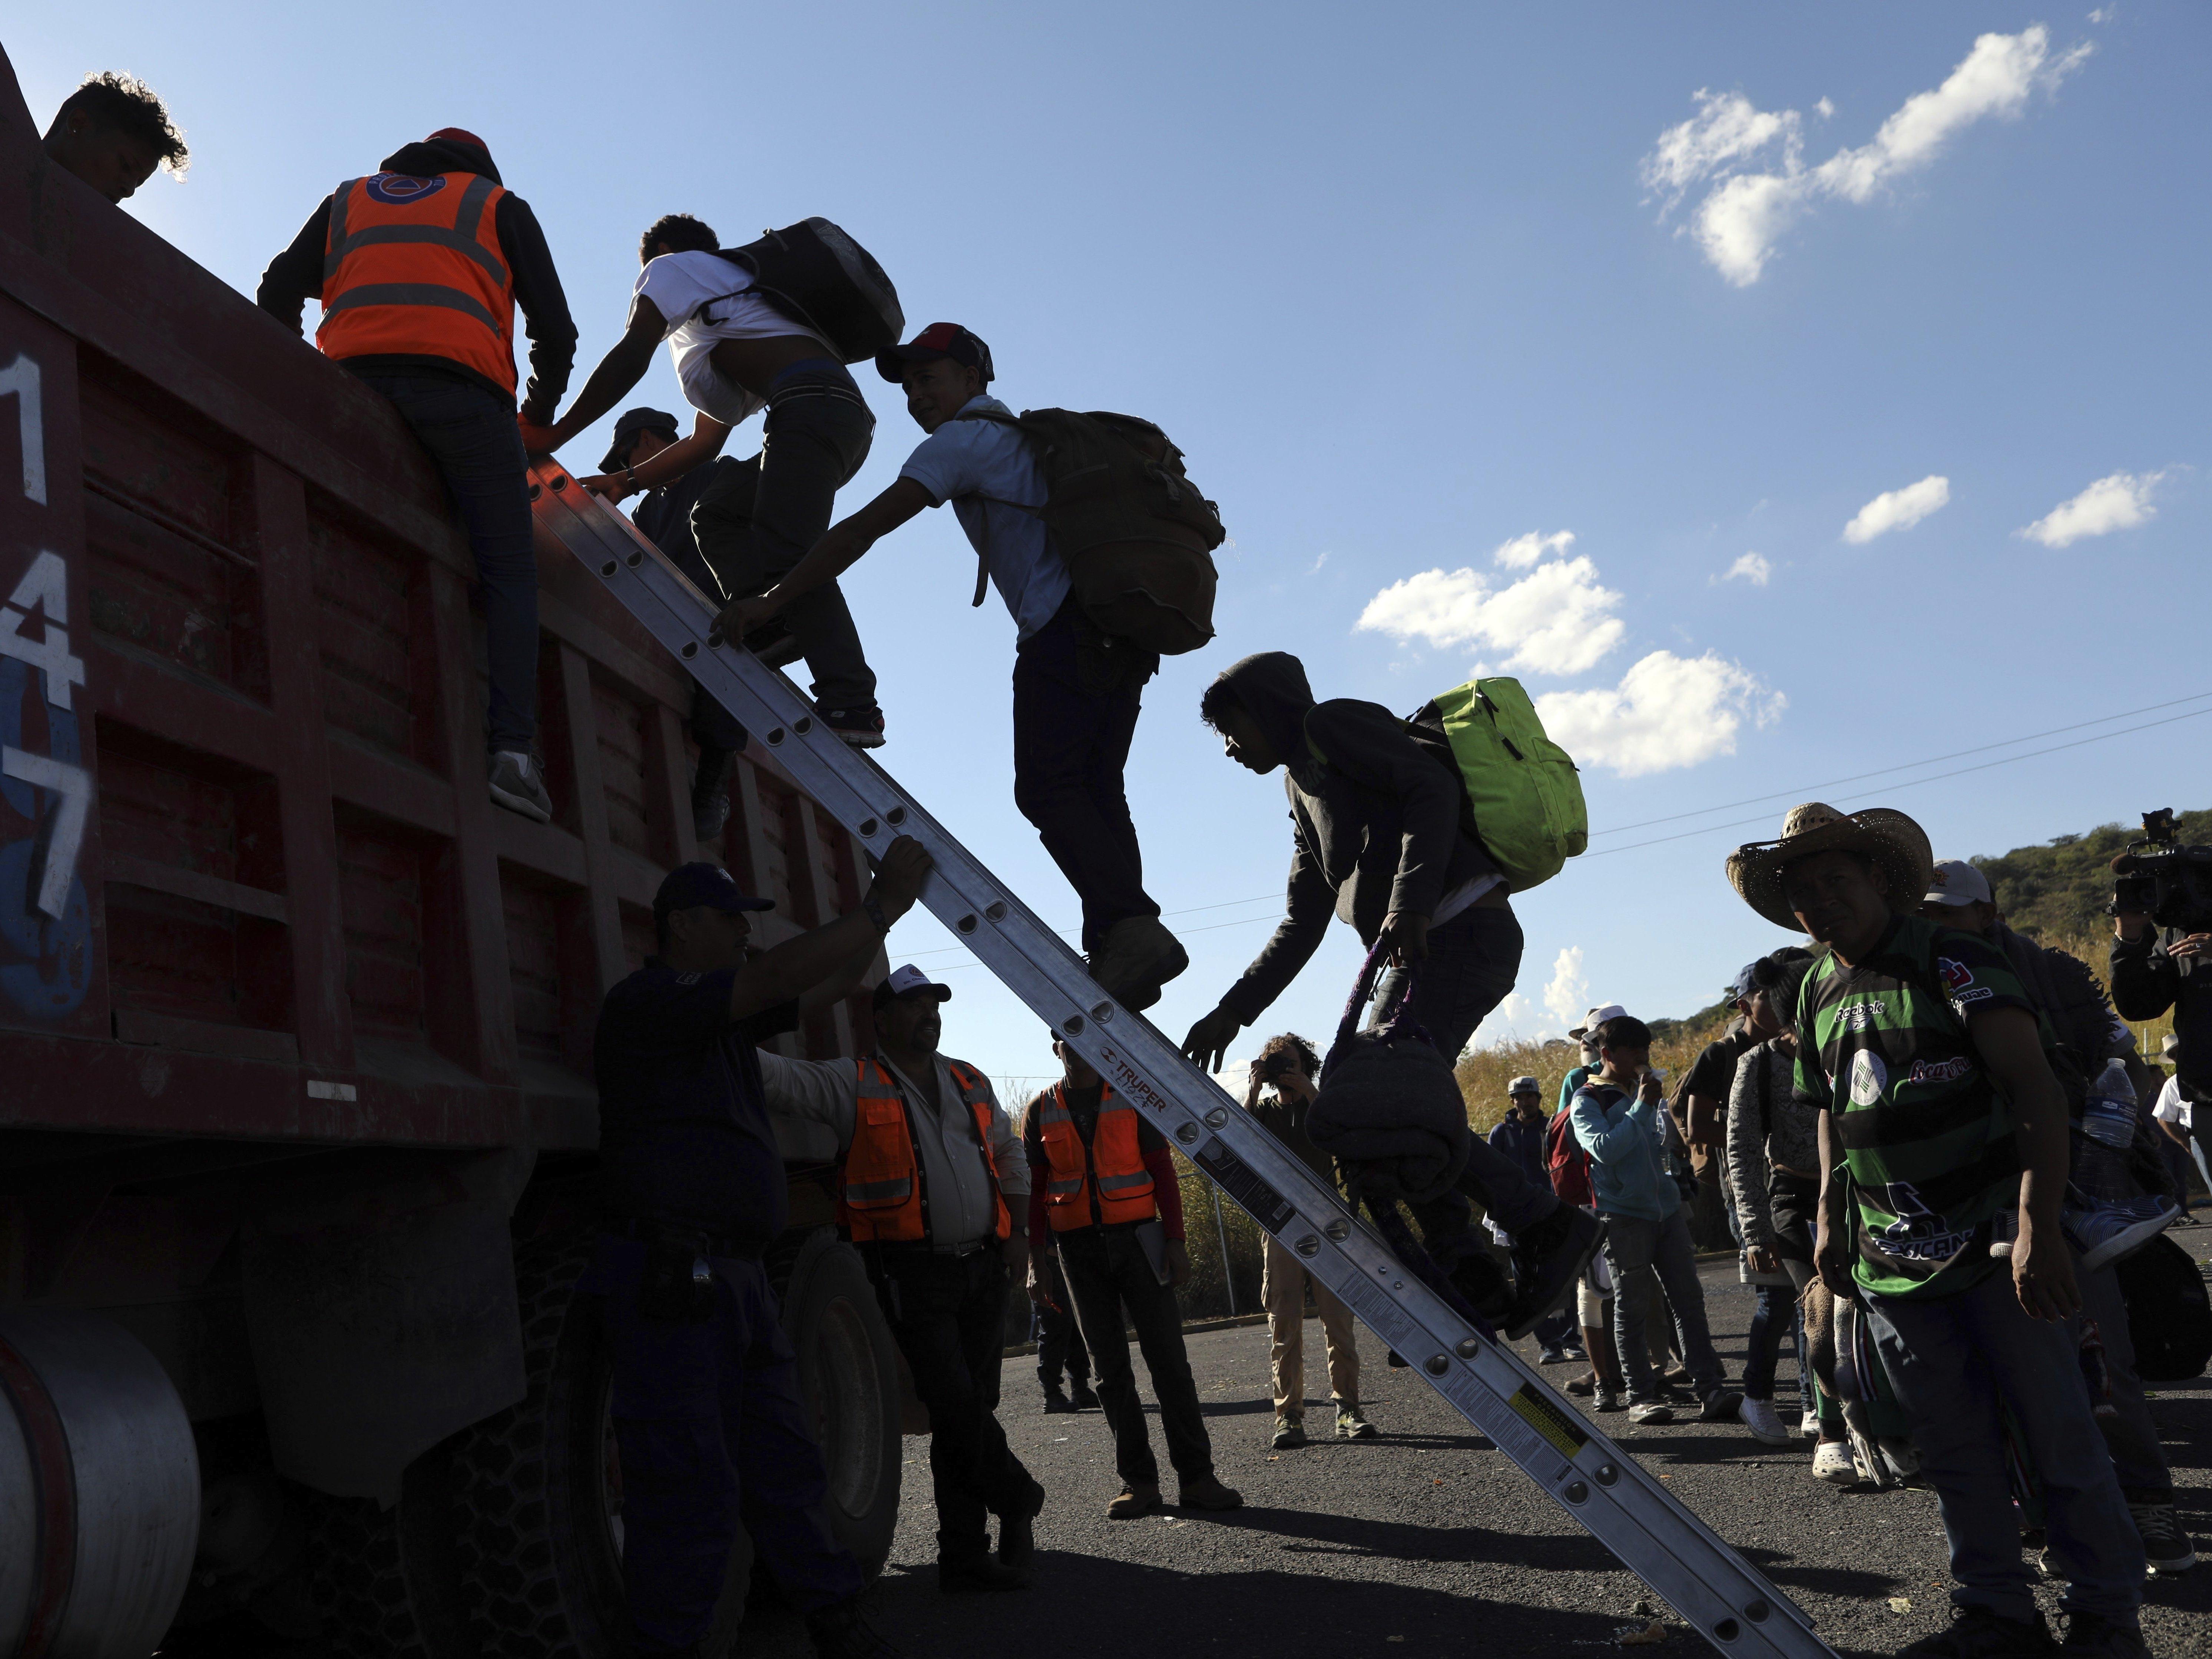 LGBT Splinter Group From Migrant Caravan Is The 1st To Arrive In Tijuana